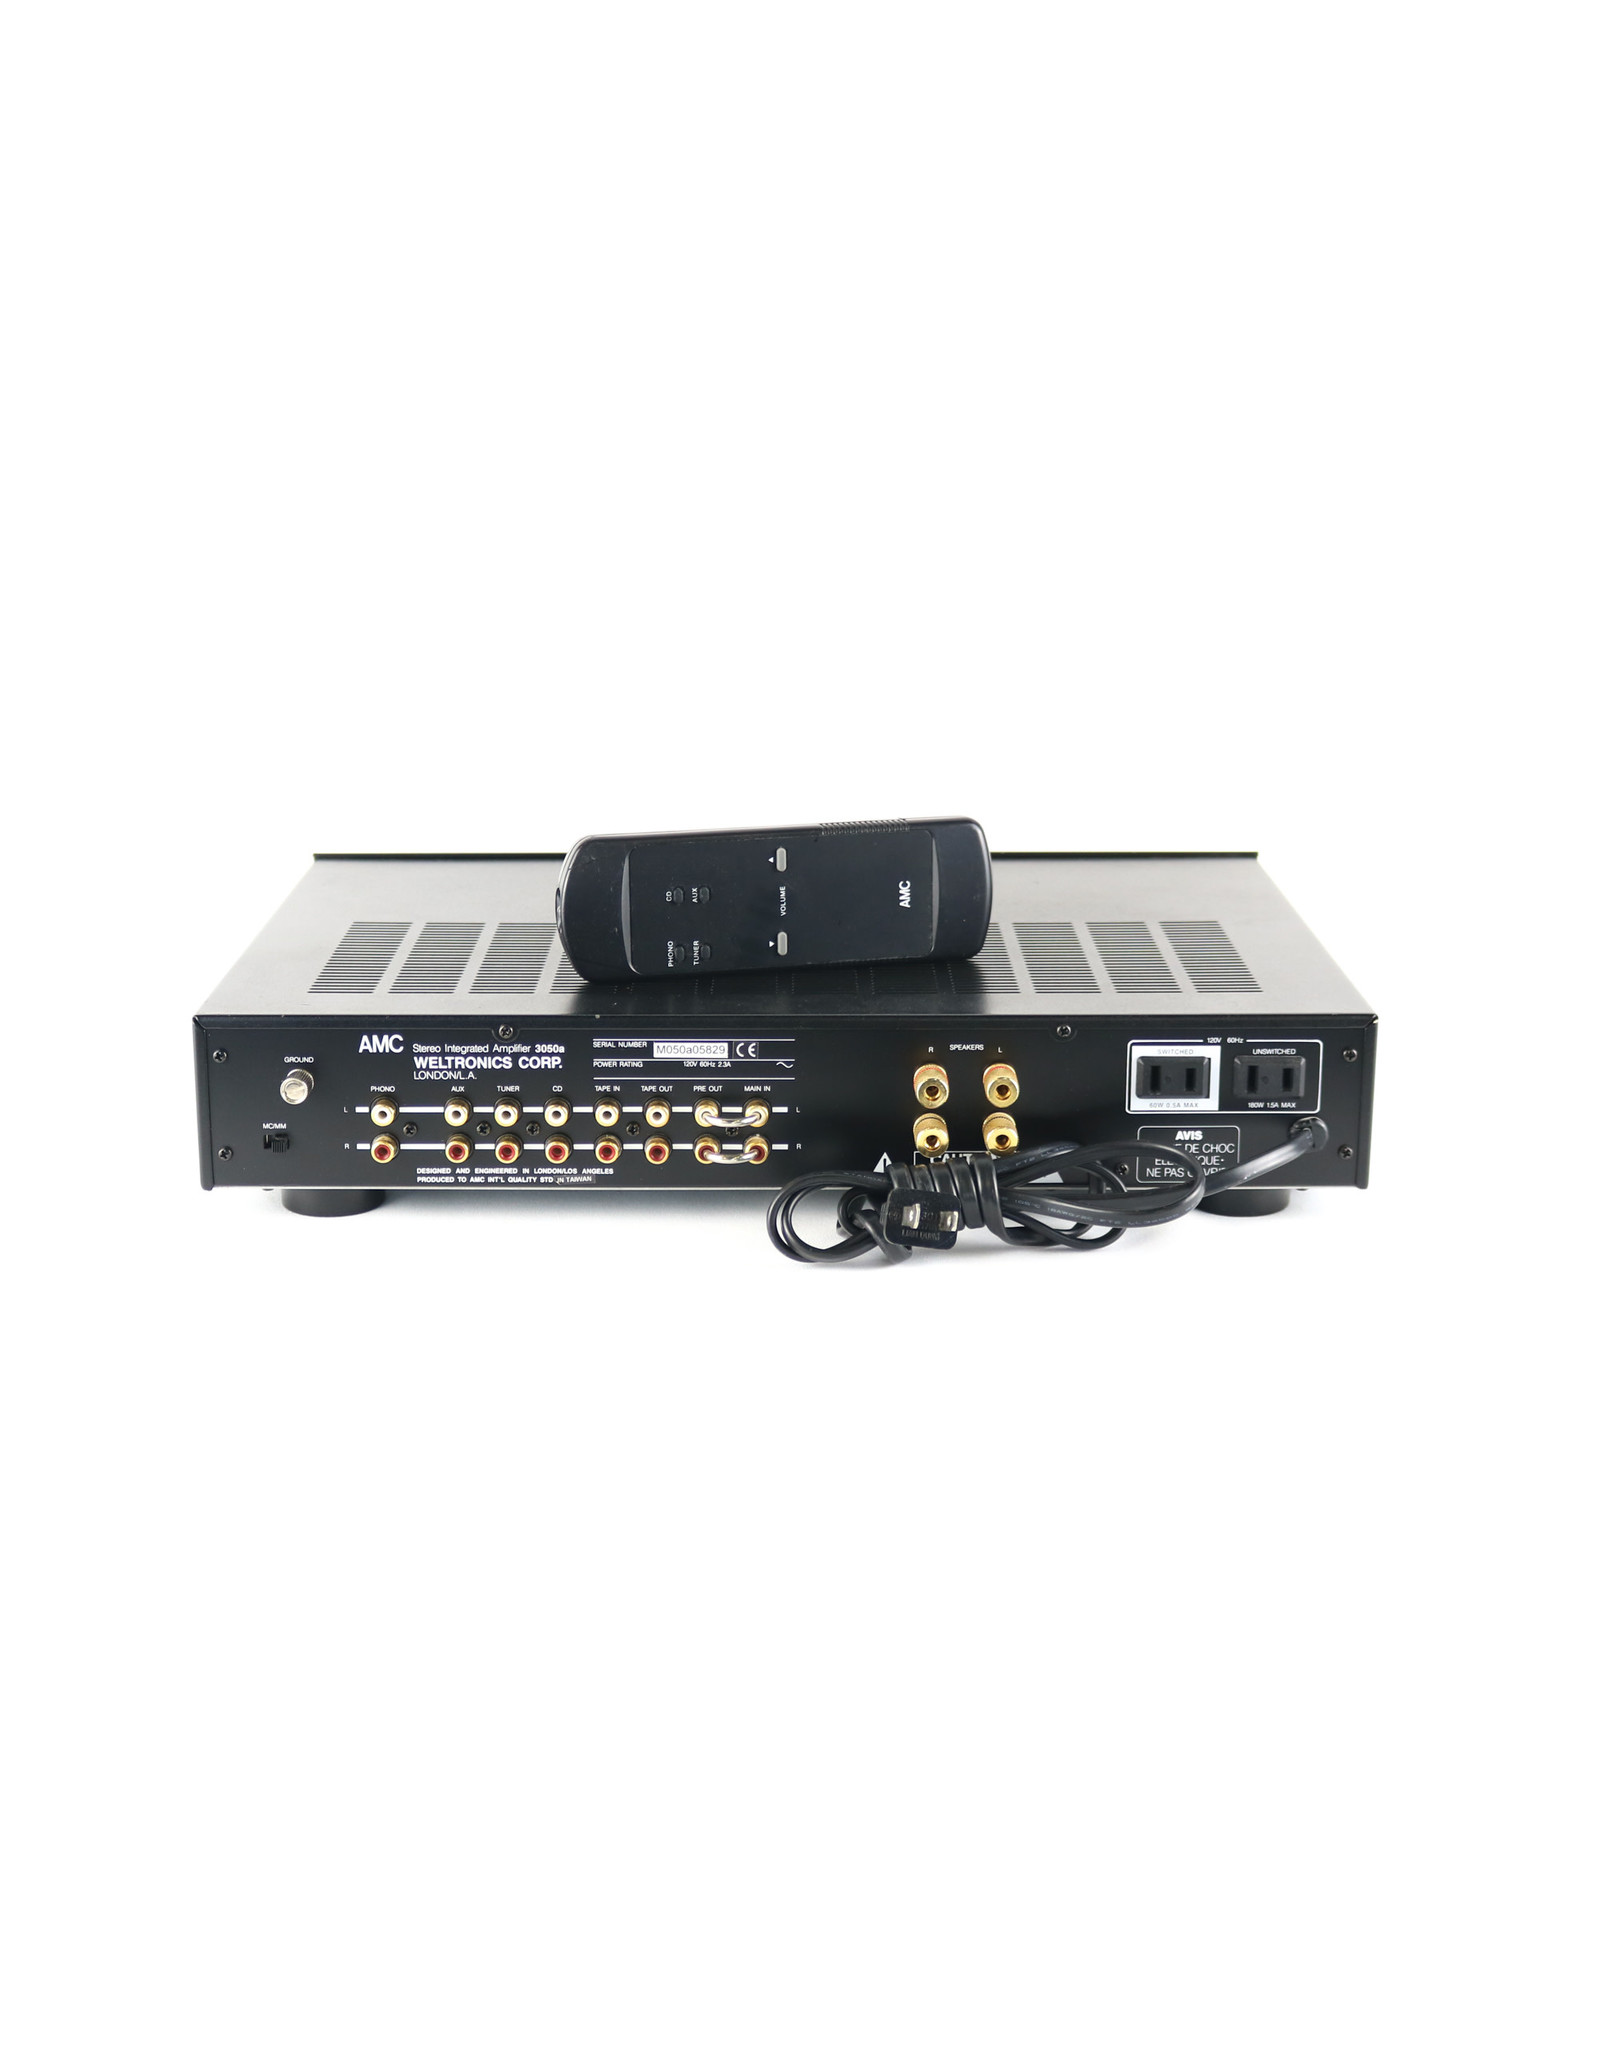 AMC AMC 3050A Integrated Amp USED